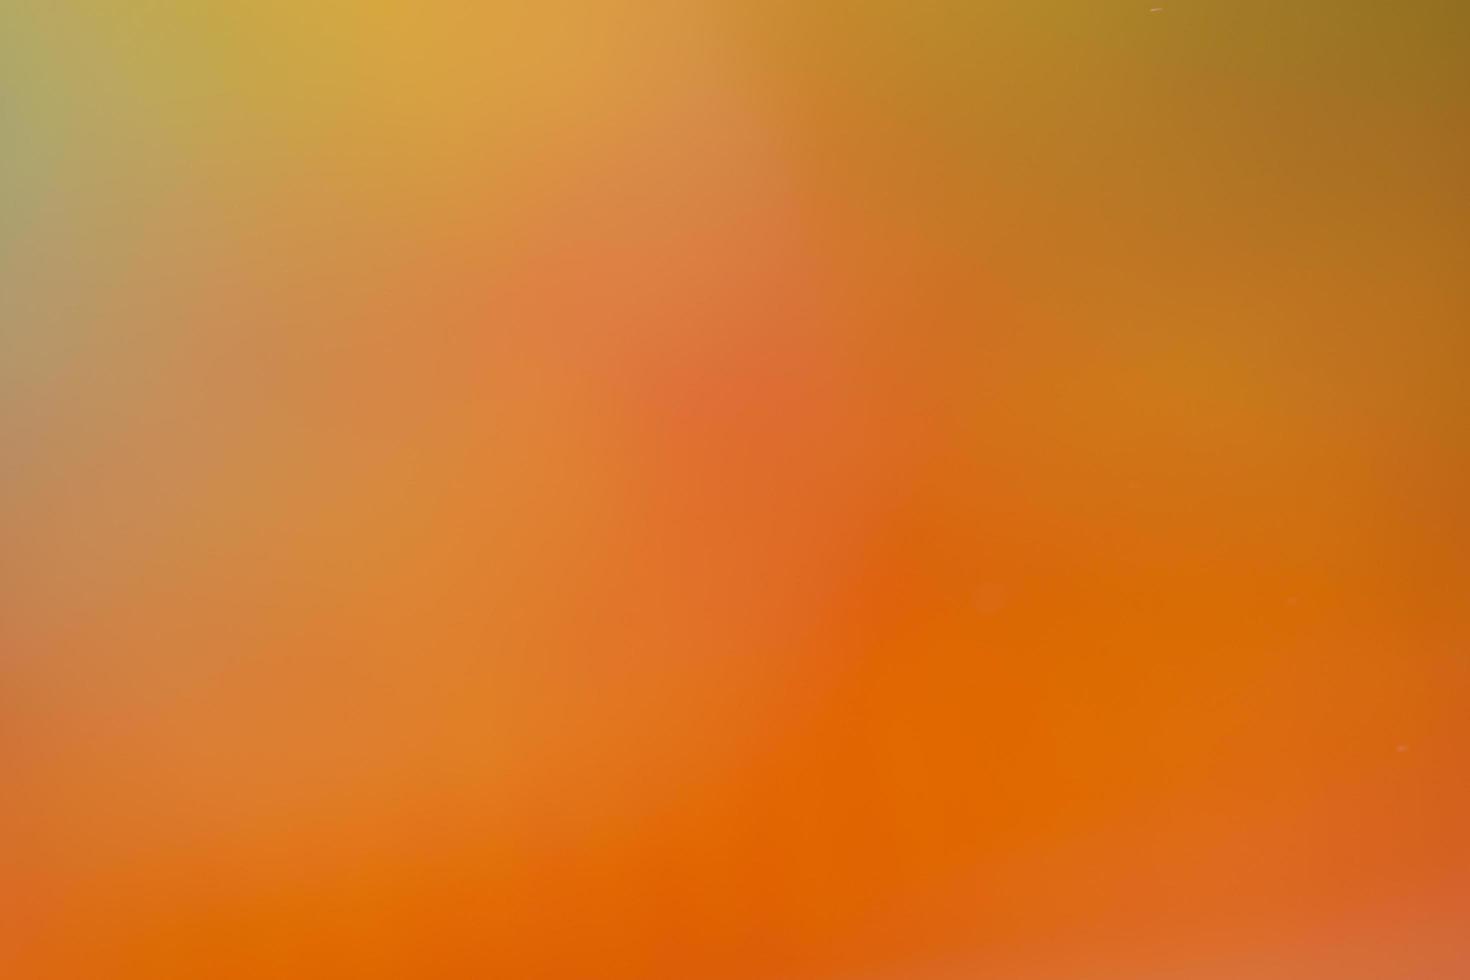 Blurred orange background photo